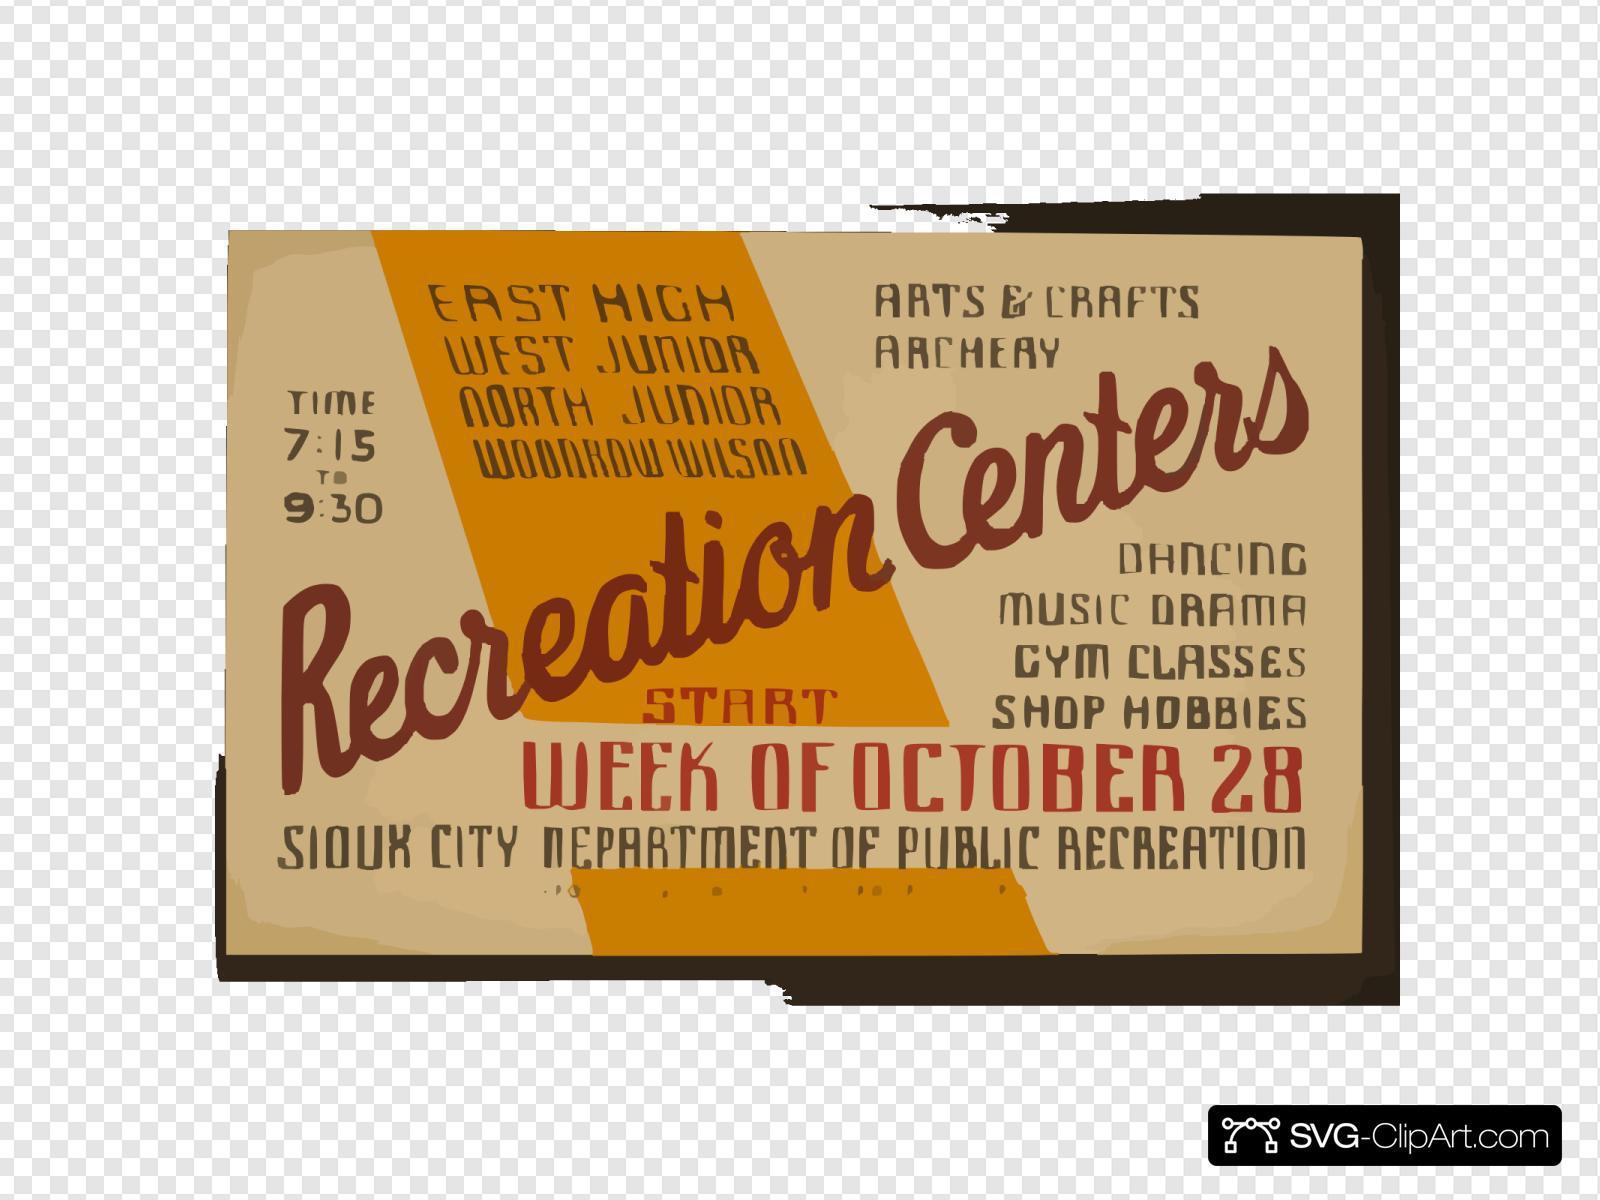 East High, West Junior, North Junior, Woodrow Wilson Recreation Centers Arts & Crafts, Archery, Dancing, Music, Drama, Gym Classes, Shop Hobbies / Poster By Iowa Art Program Wpa.